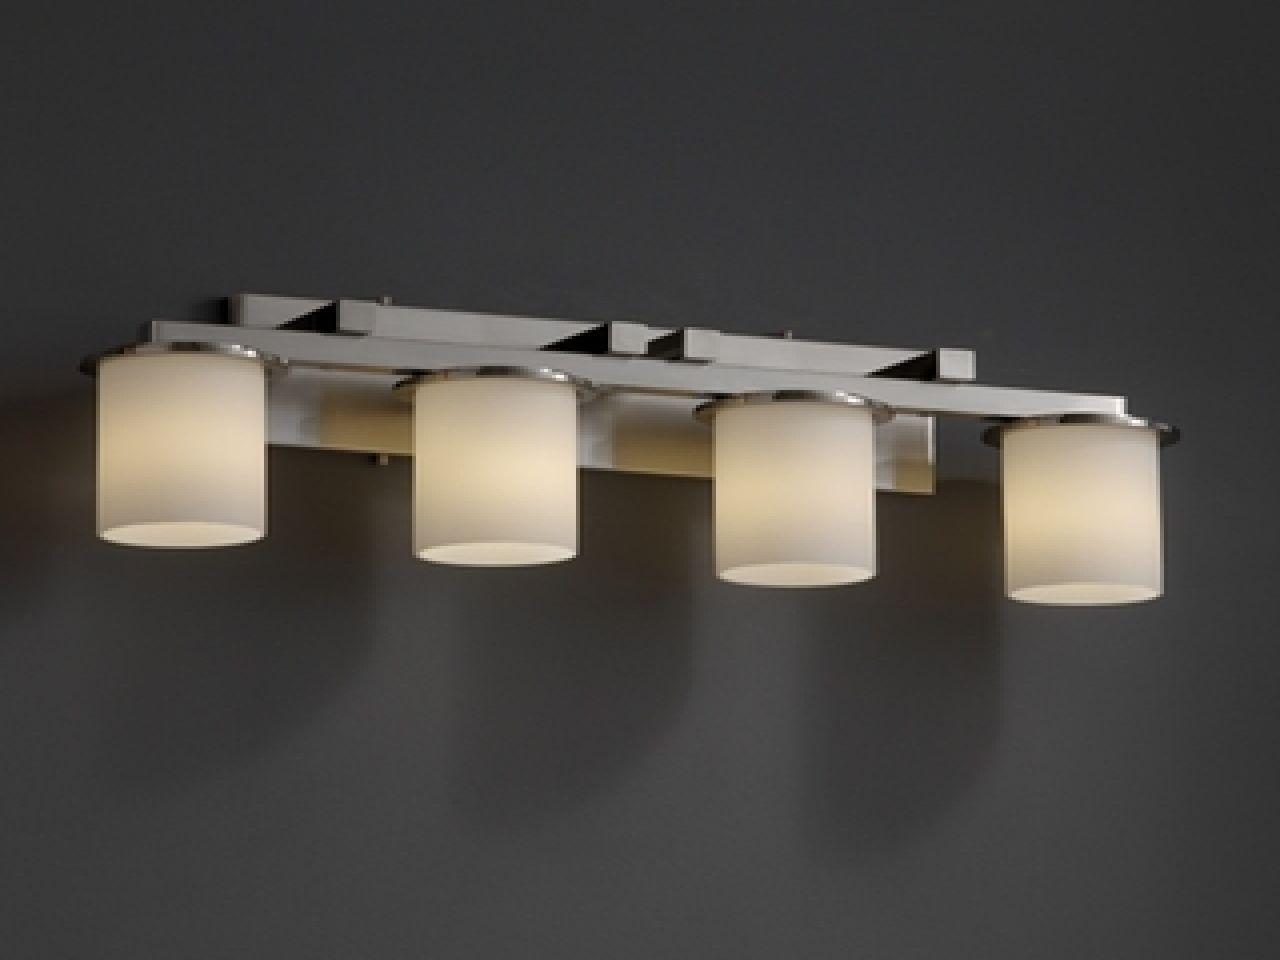 Versatile Bathroom Light Fixtures Brushed Nickel for Your House